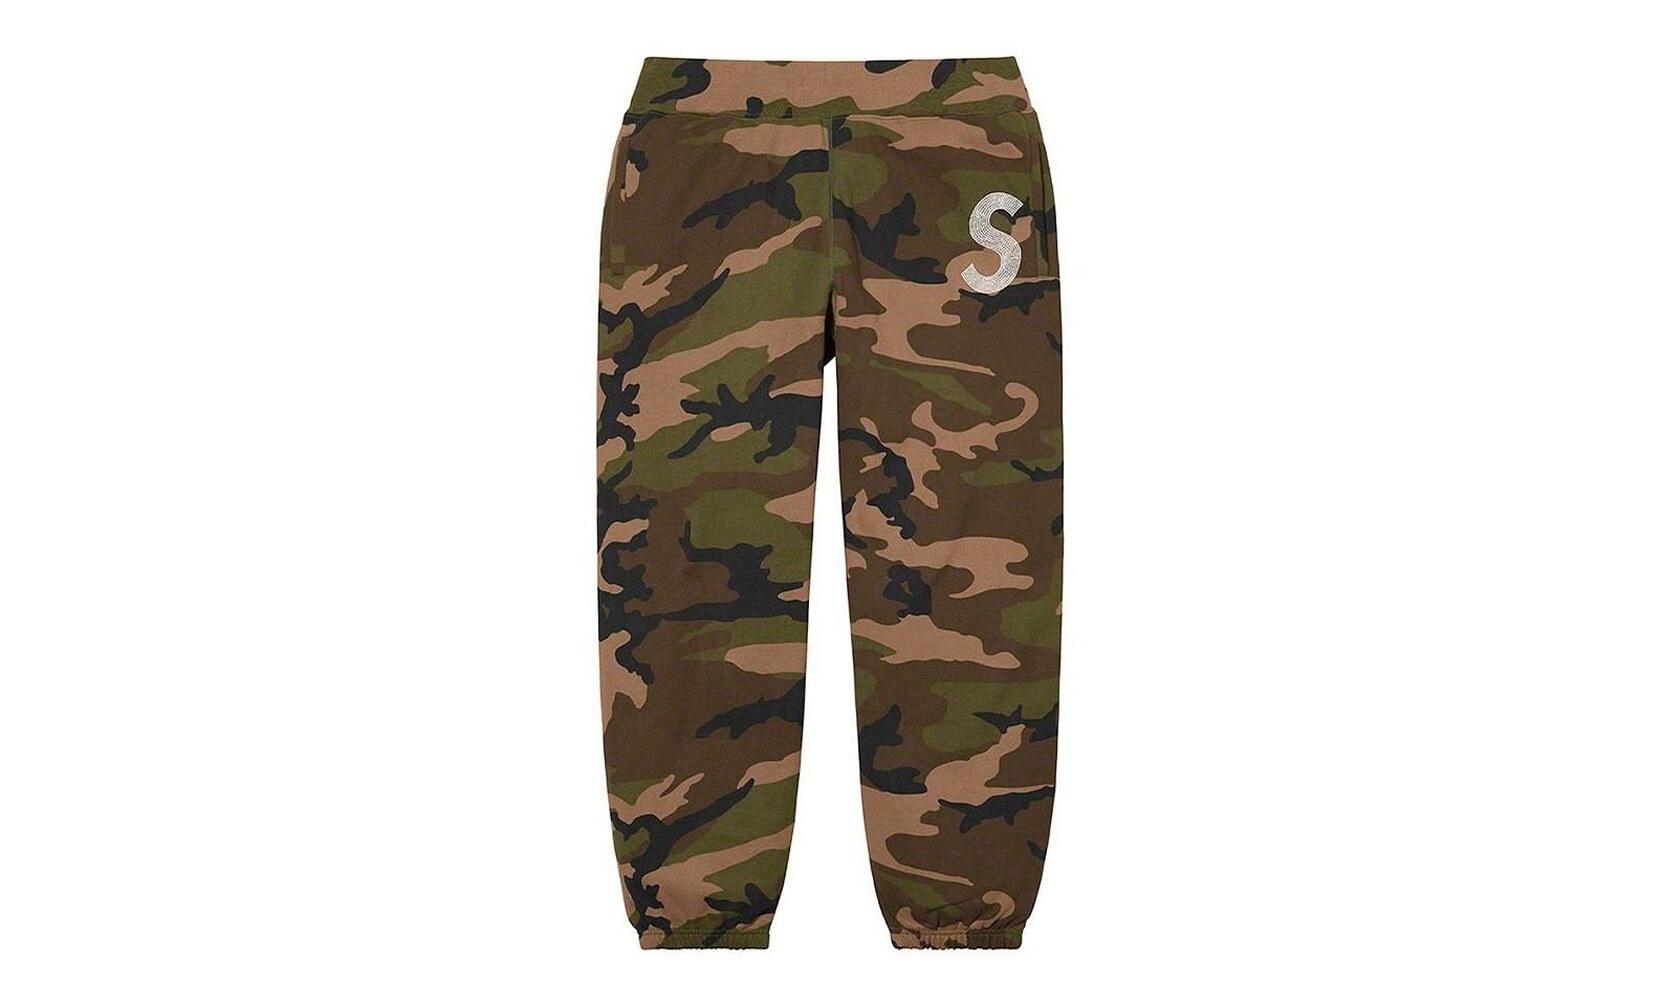 Supreme x Swarovski Pants